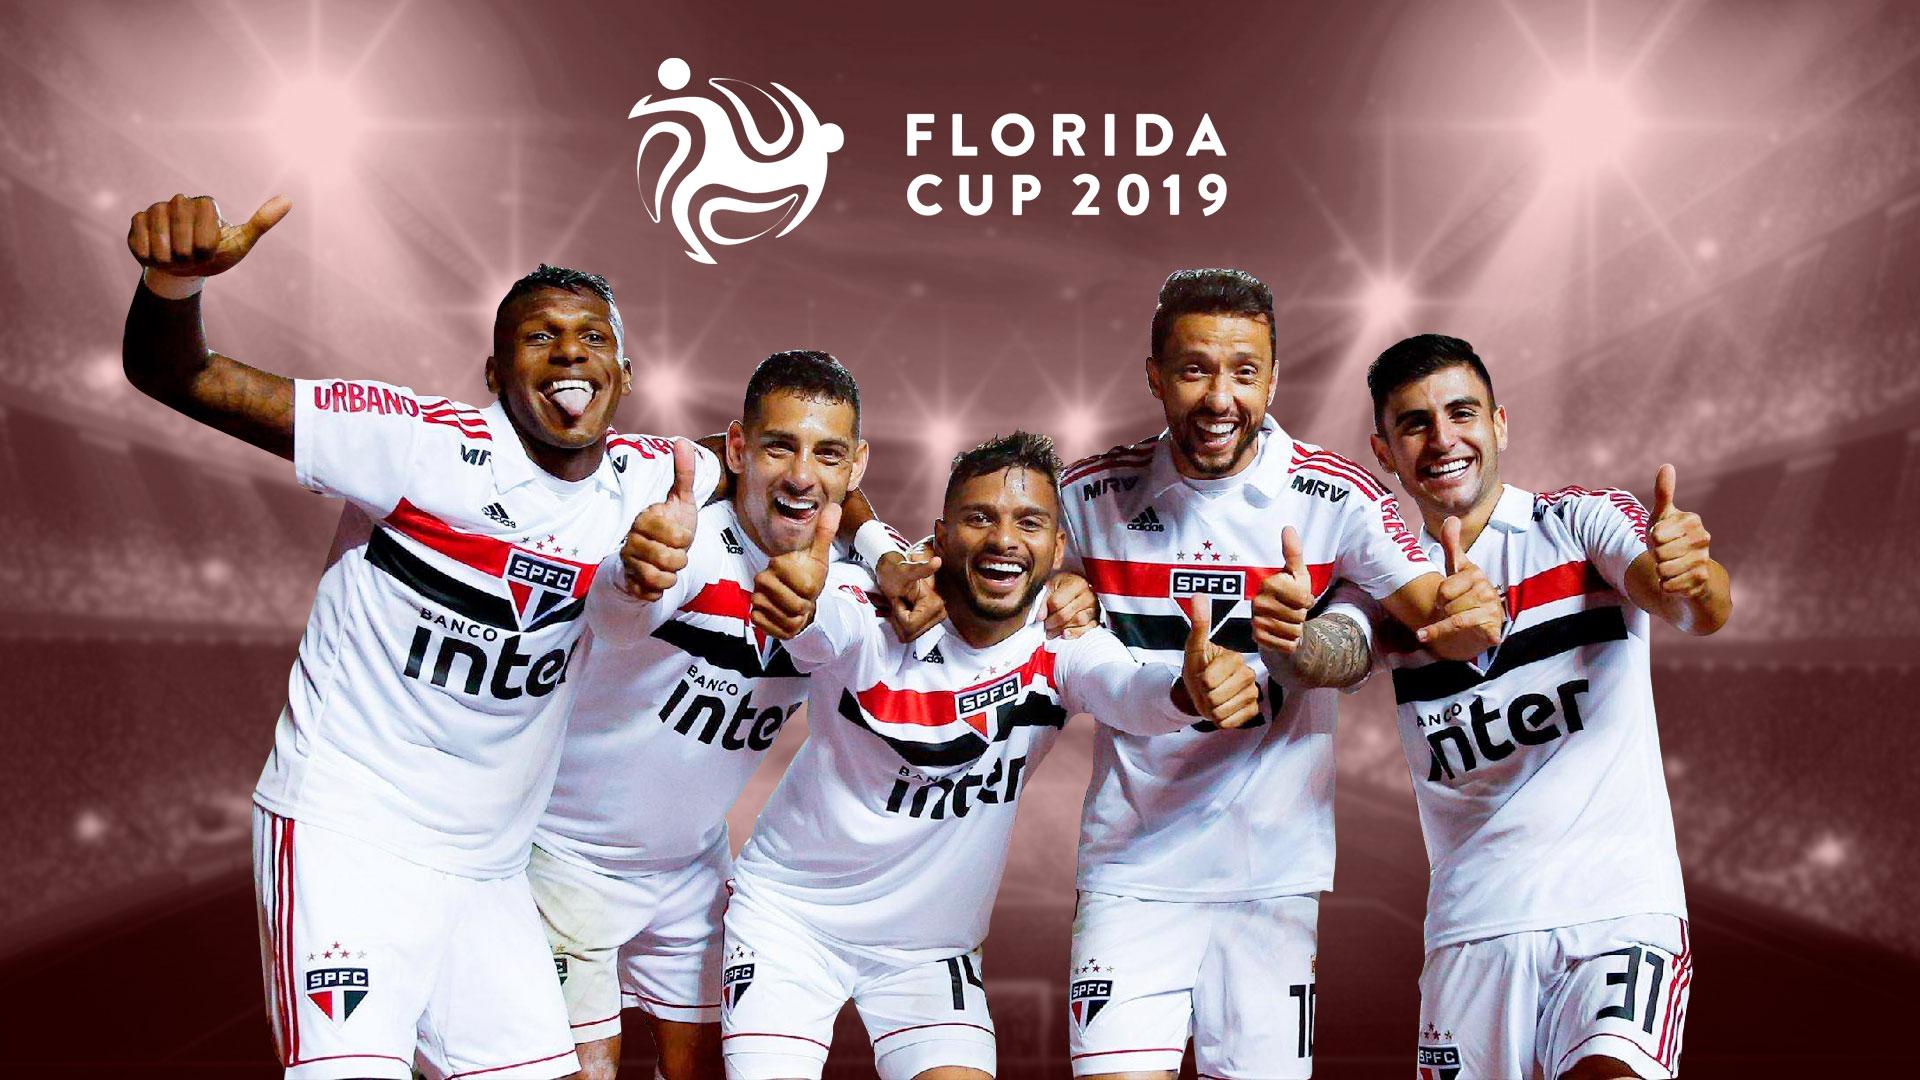 Форма Сан-Паулу к кубку Флориды 2019